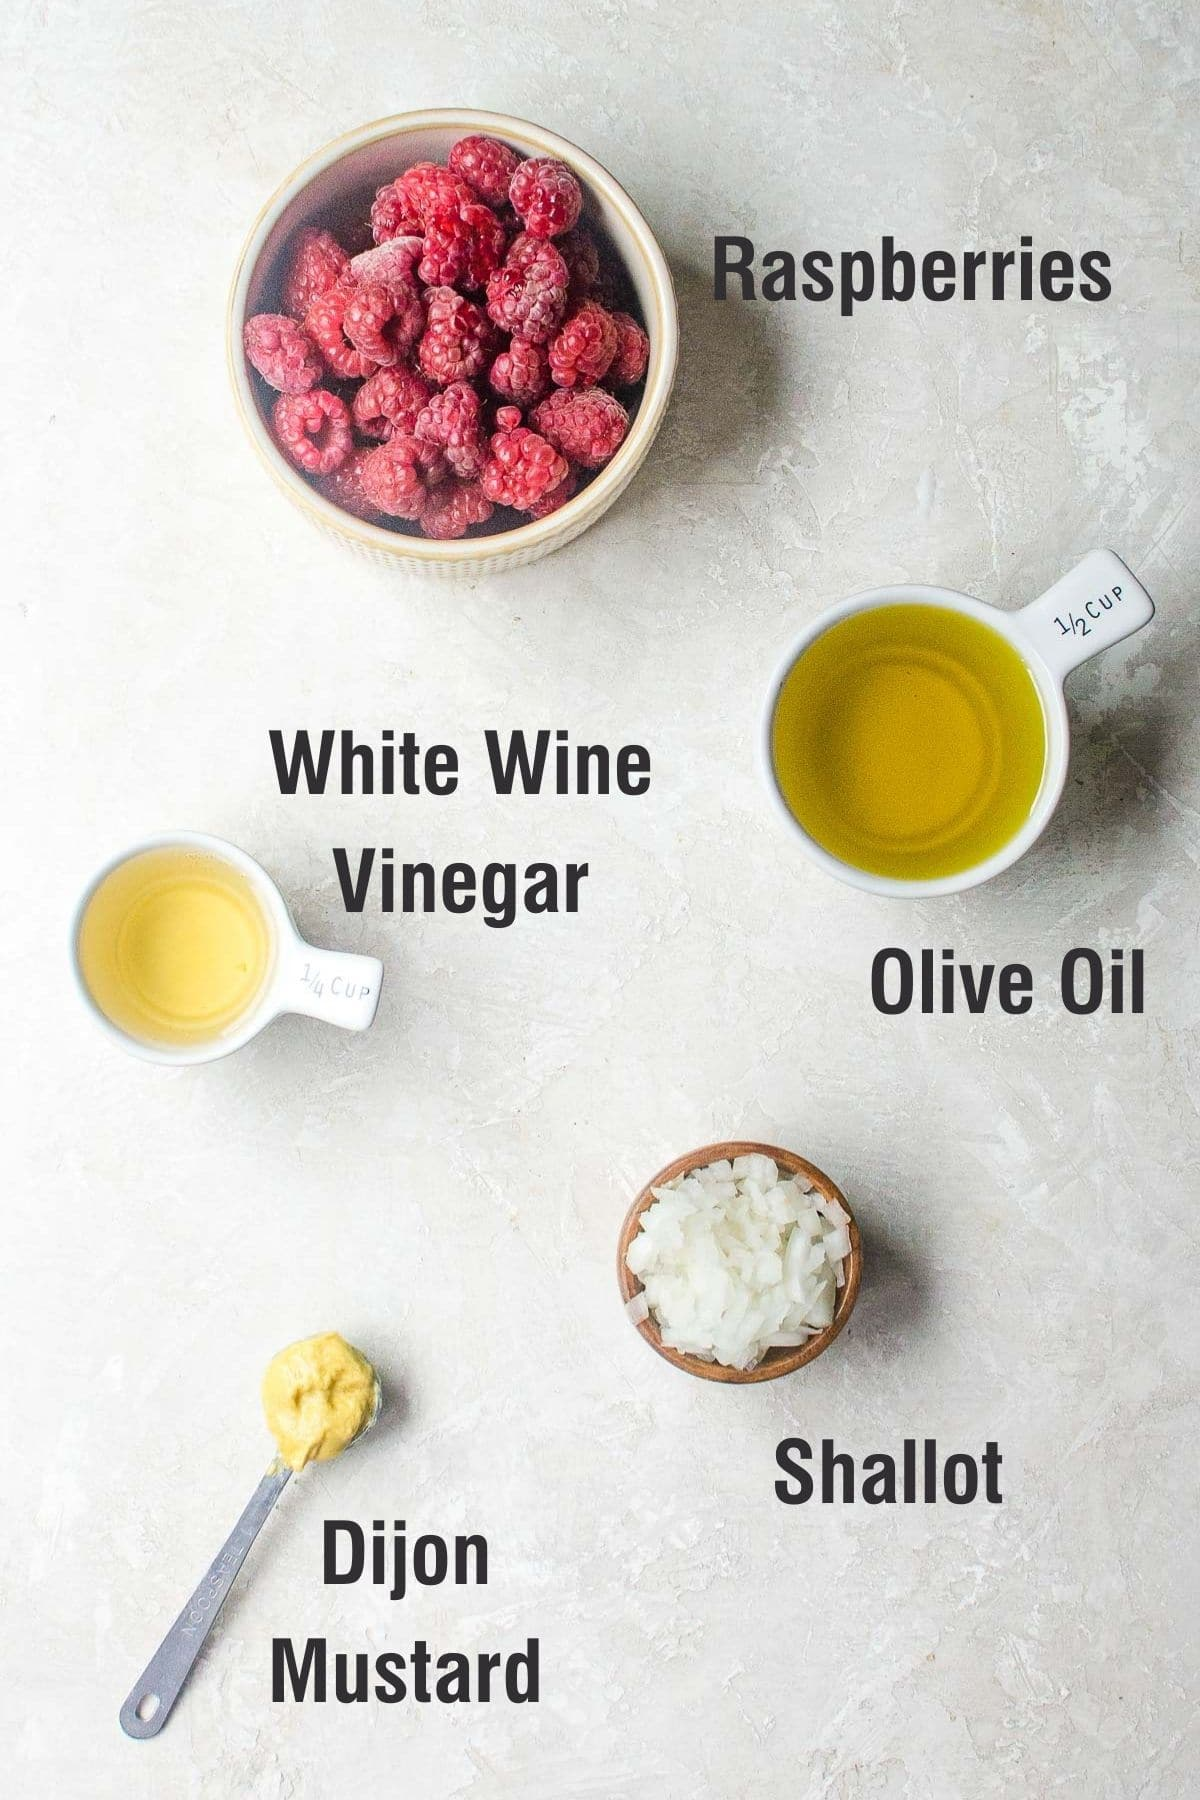 Labeled ingredients for making raspberry vinaigrette.